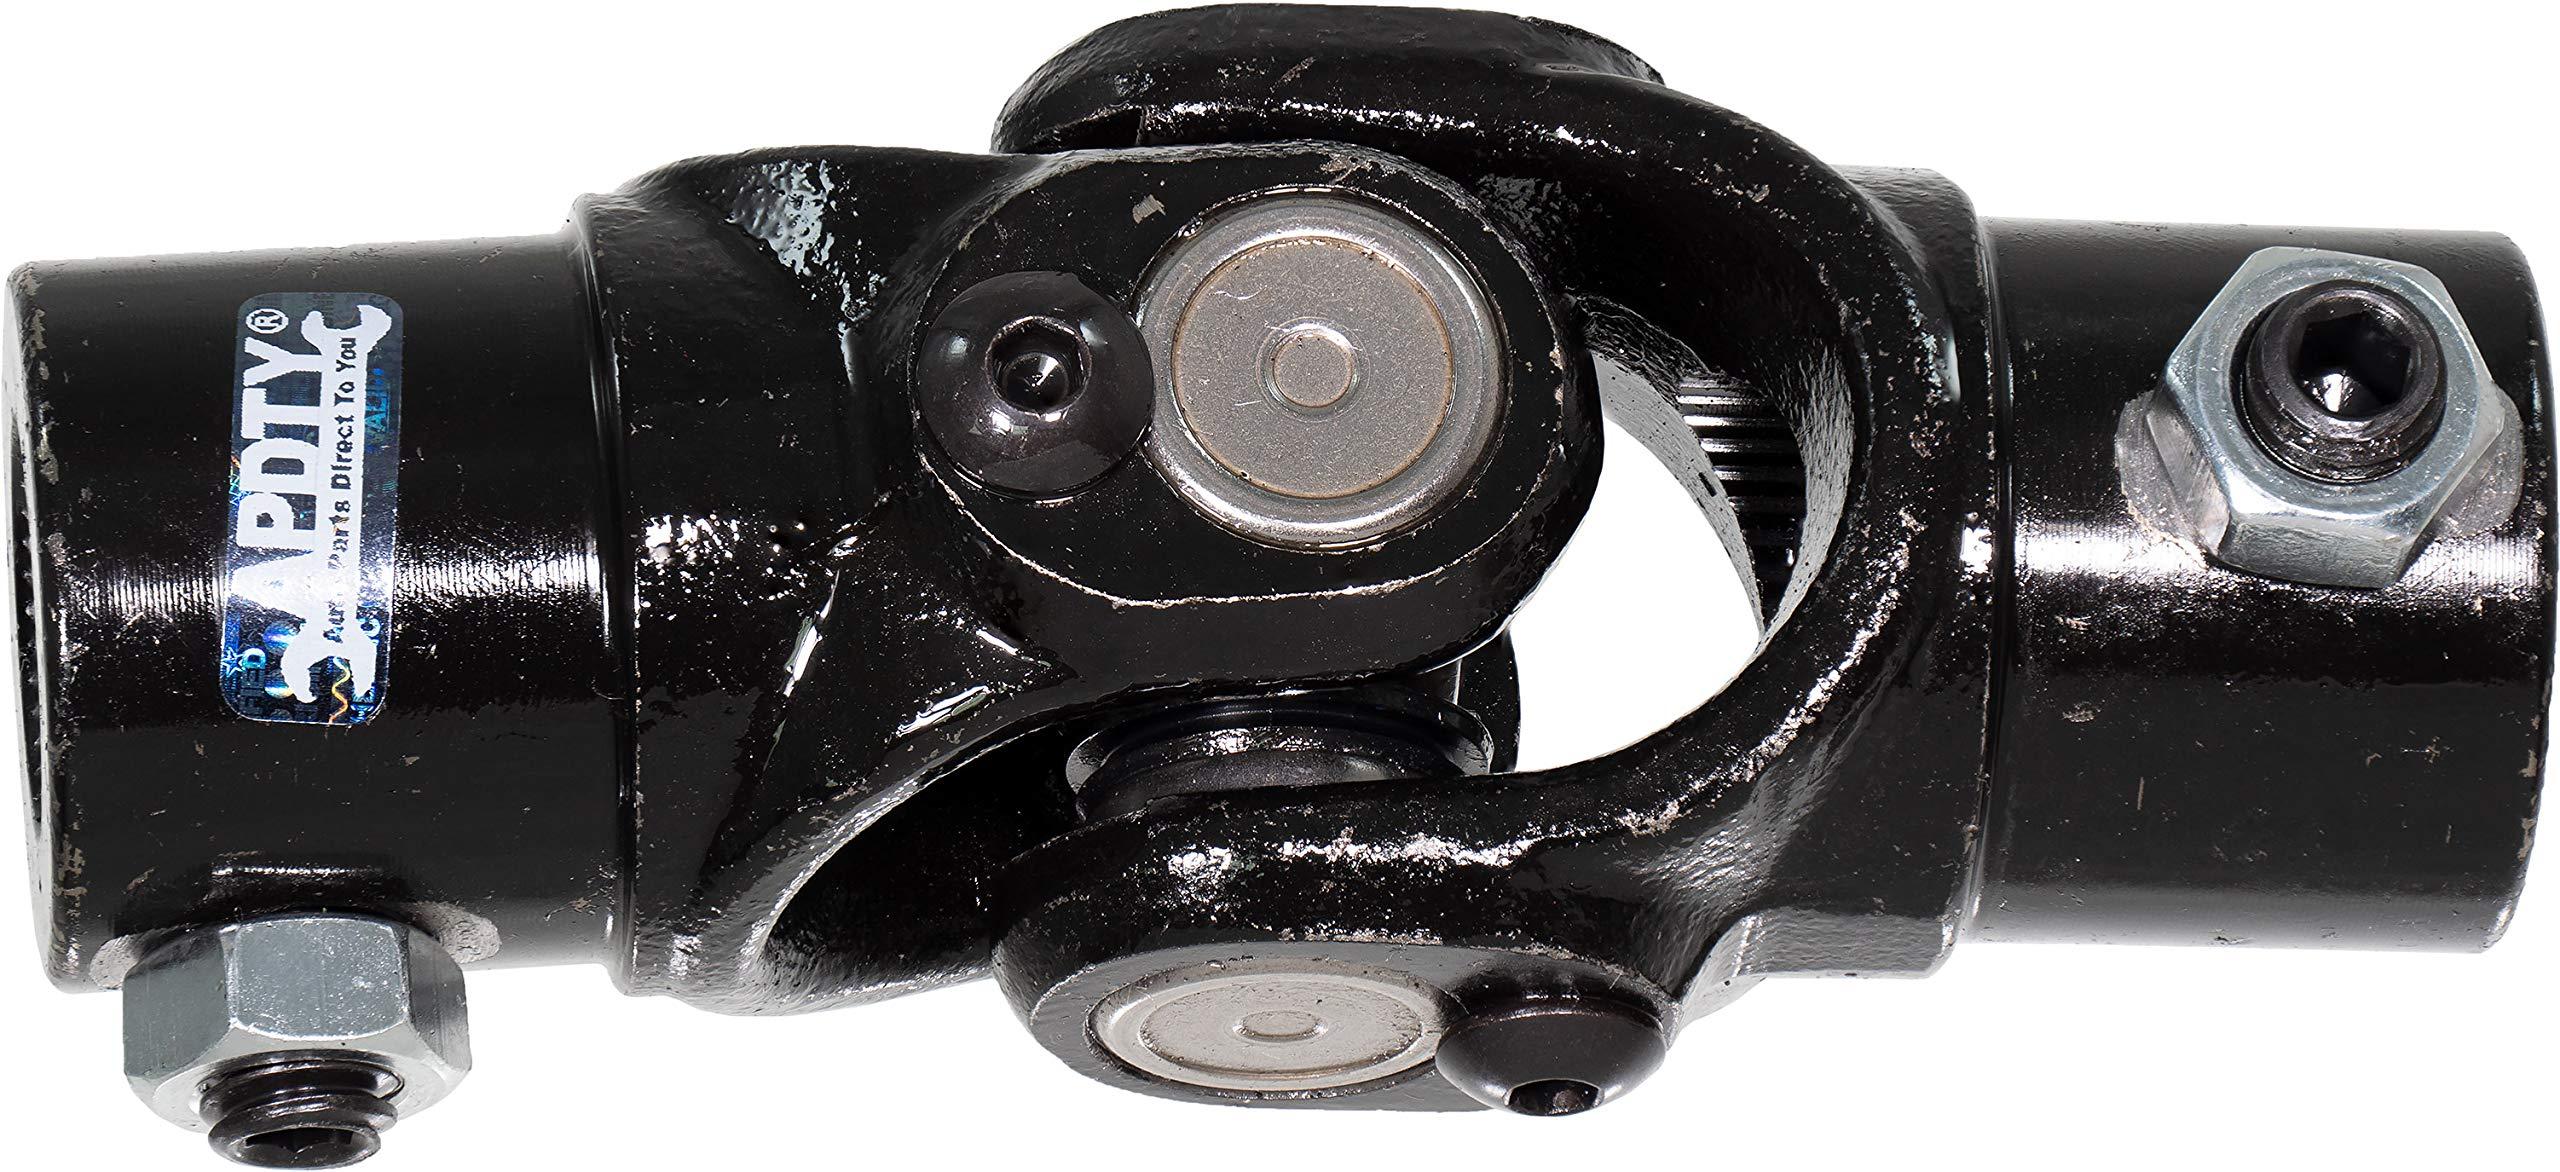 APDTY 141587 Bolt-On Steering Shaft Universal U-Joint 5/8'' x 5/8'' 36 Spline